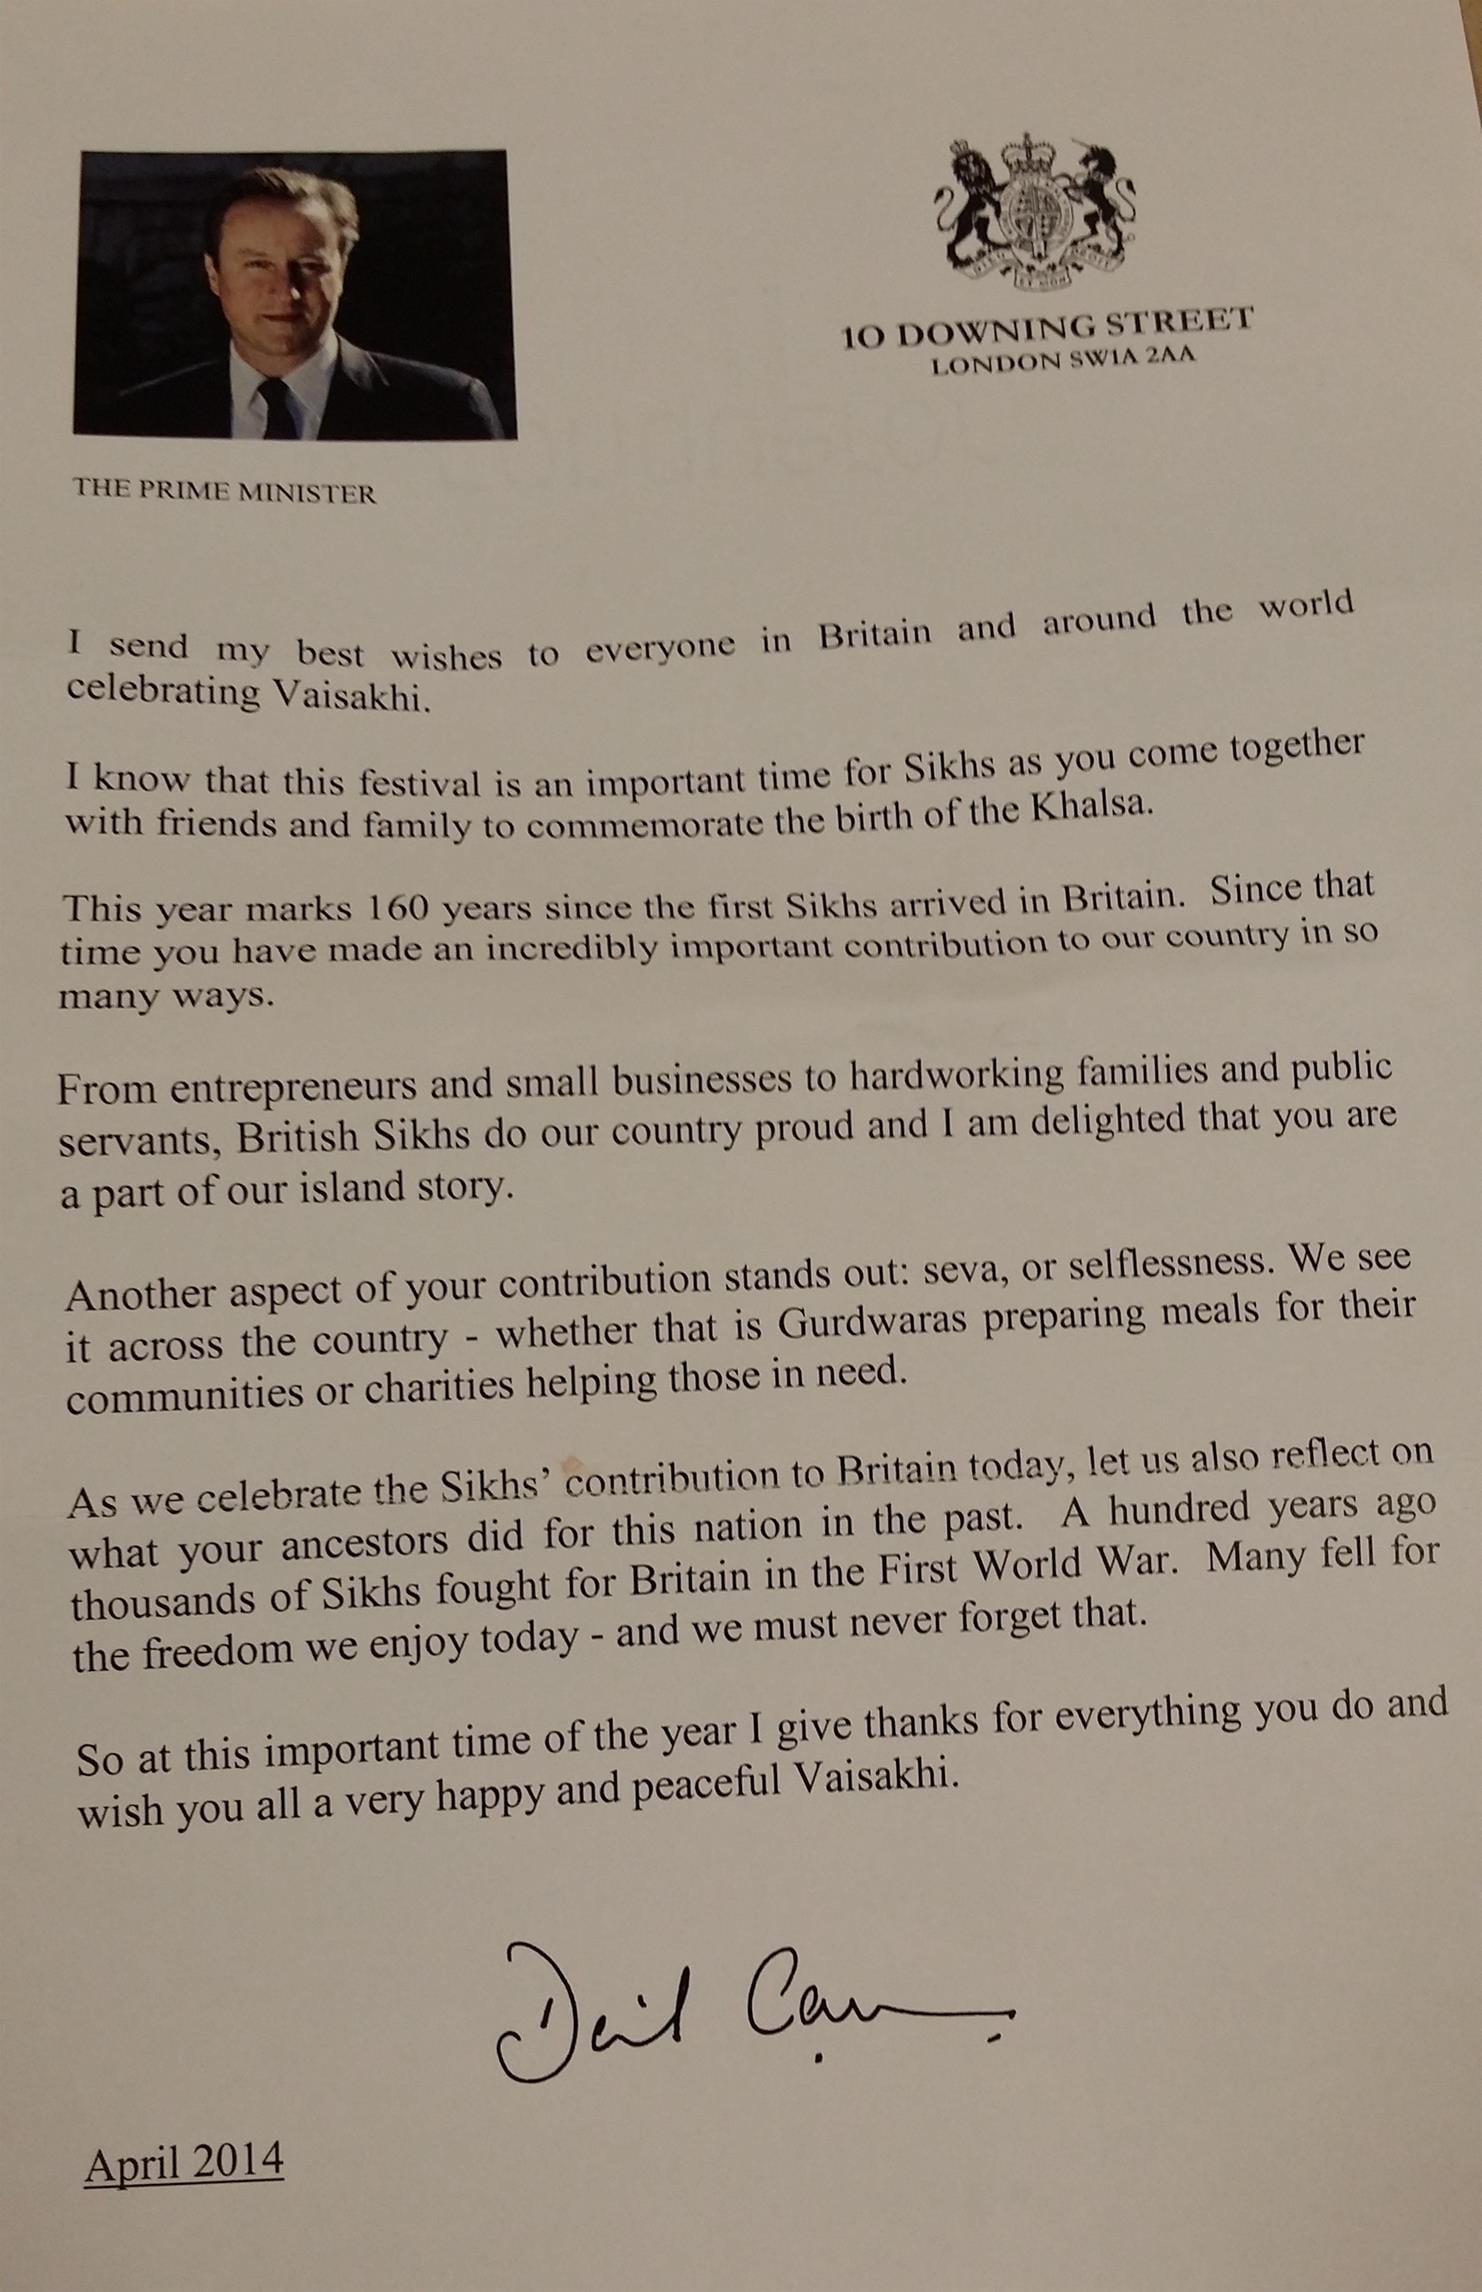 LONDON UKu2014UK Prime Minister David Cameron sends